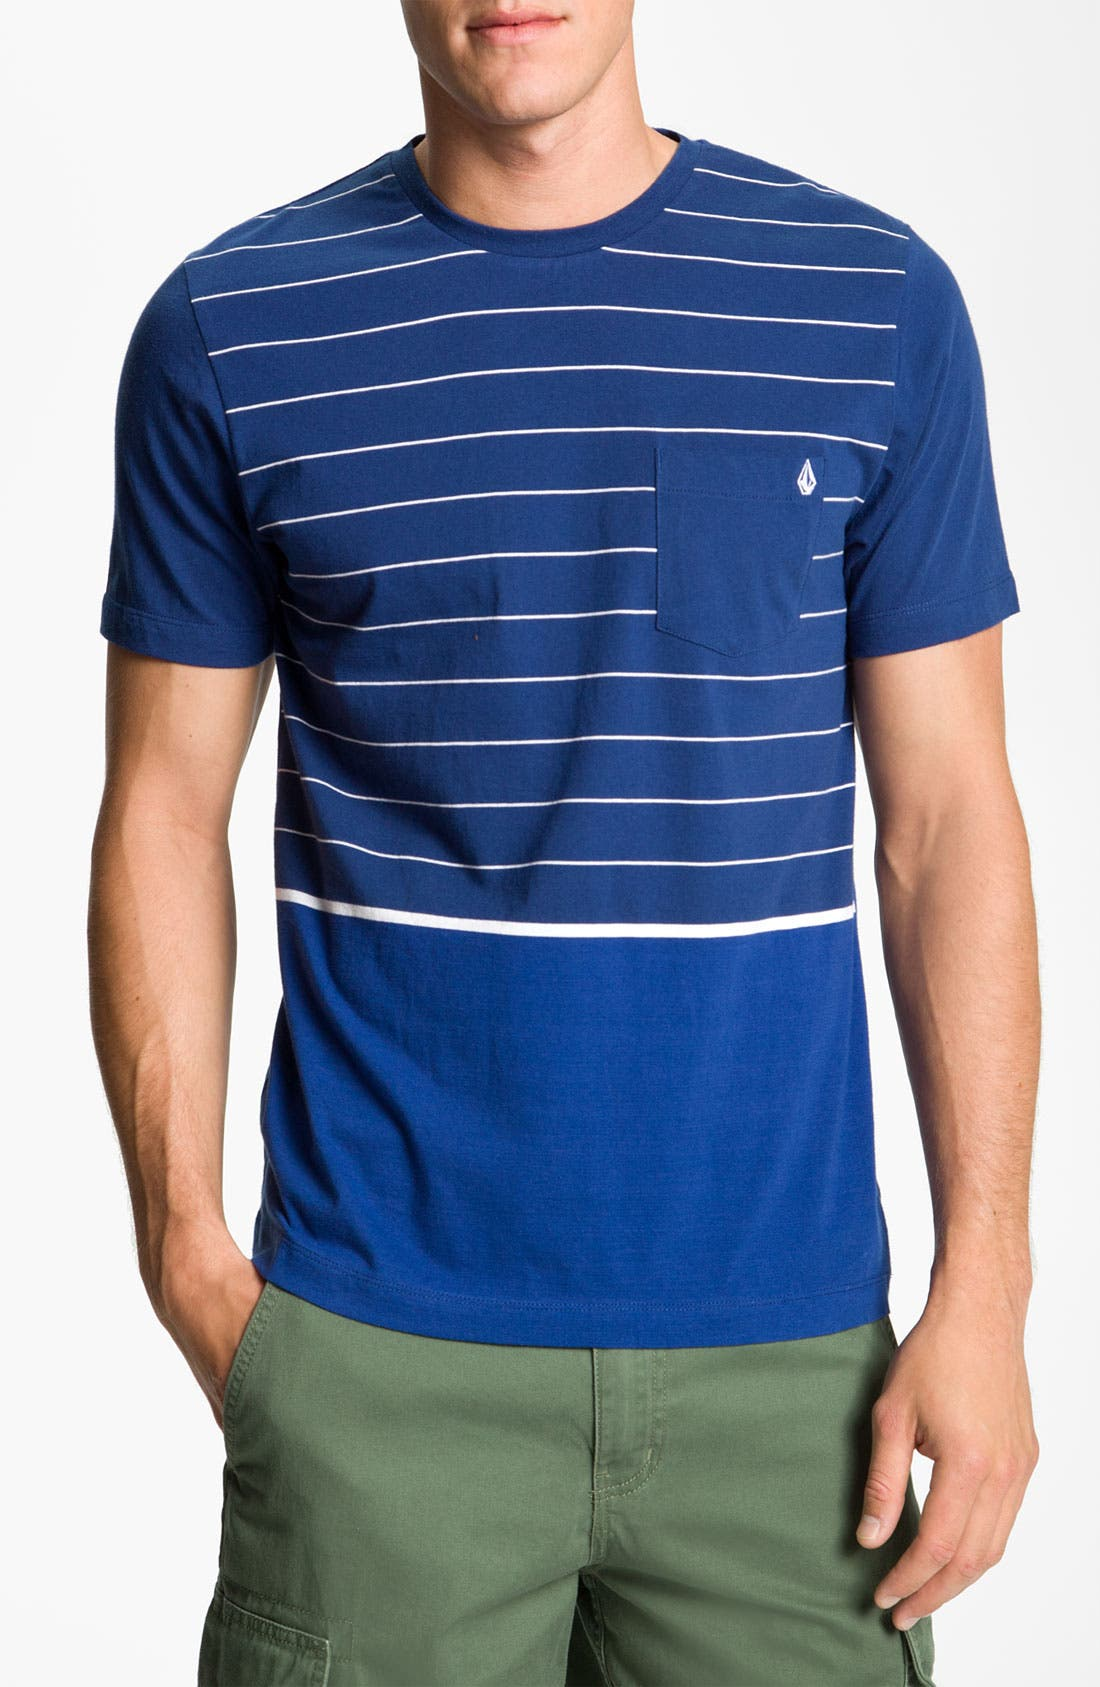 Alternate Image 1 Selected - Volcom 'Primer' Stripe Print Organic Cotton T-Shirt